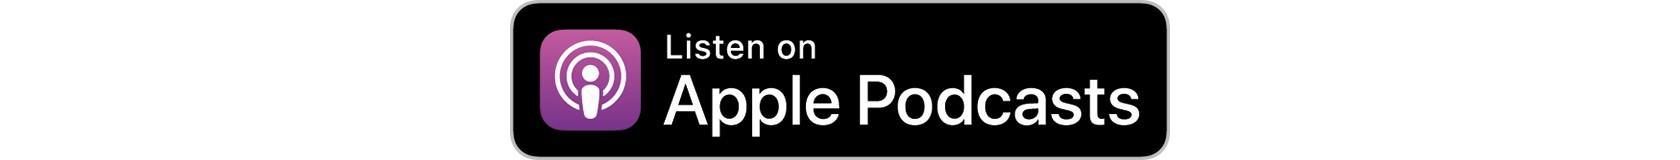 podcast platforms appleiTunes